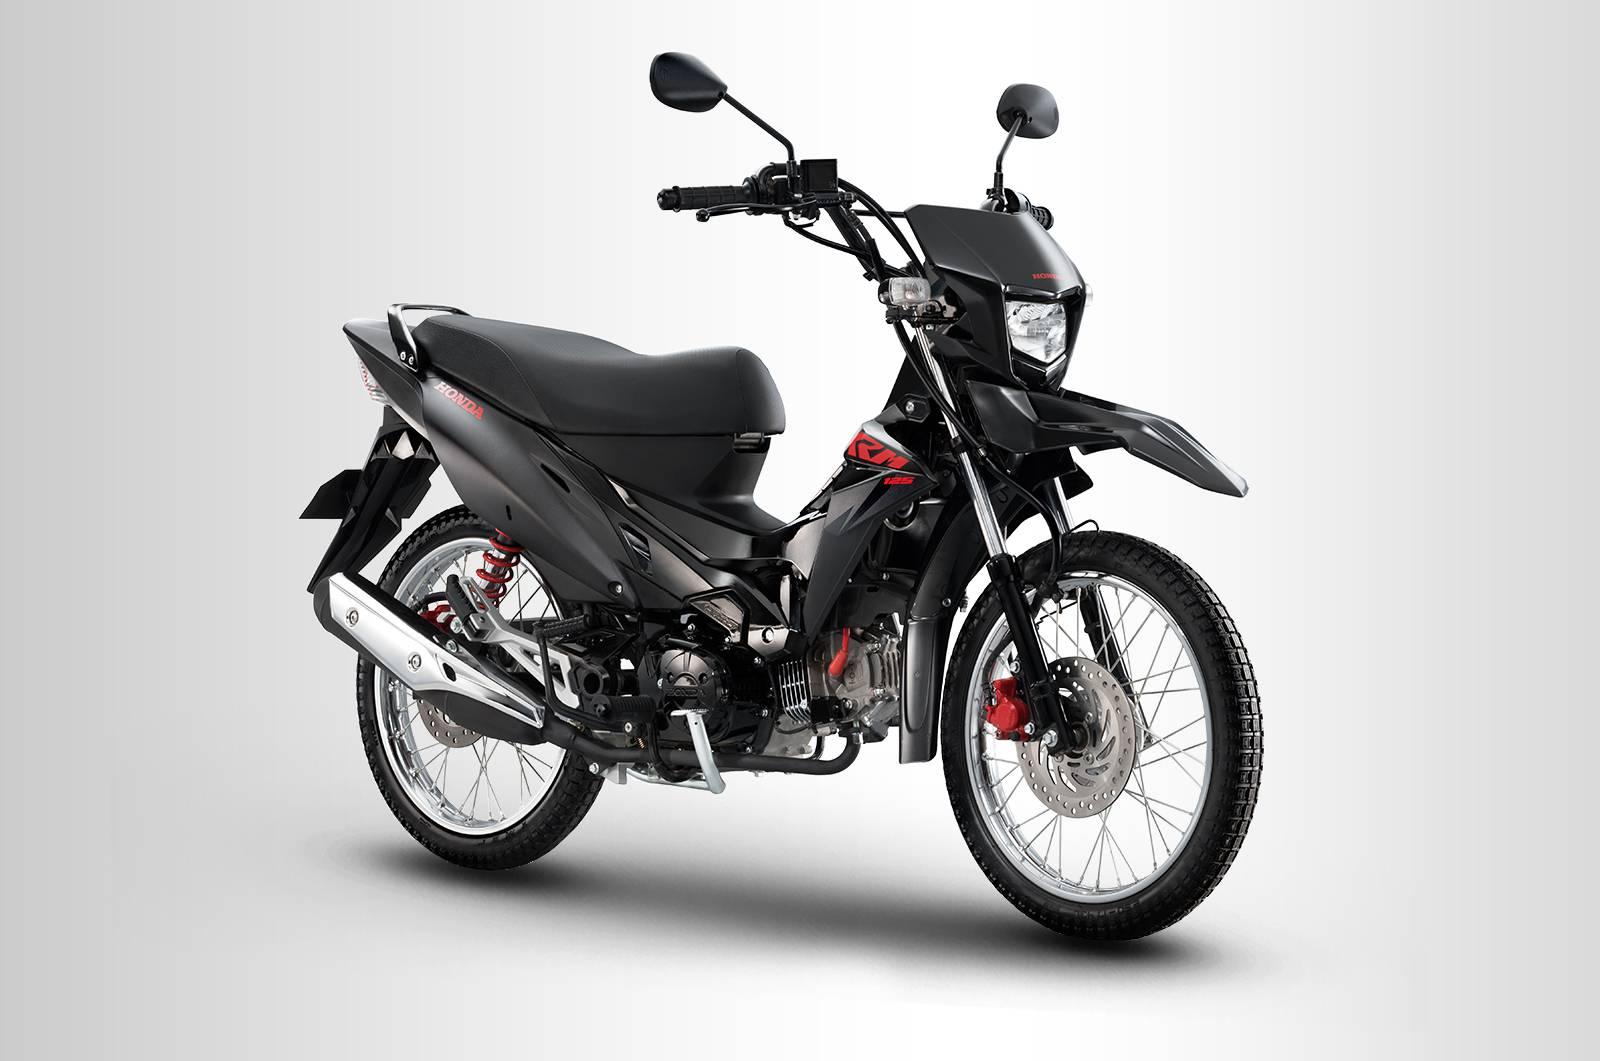 Honda xrm 125 dsx fi